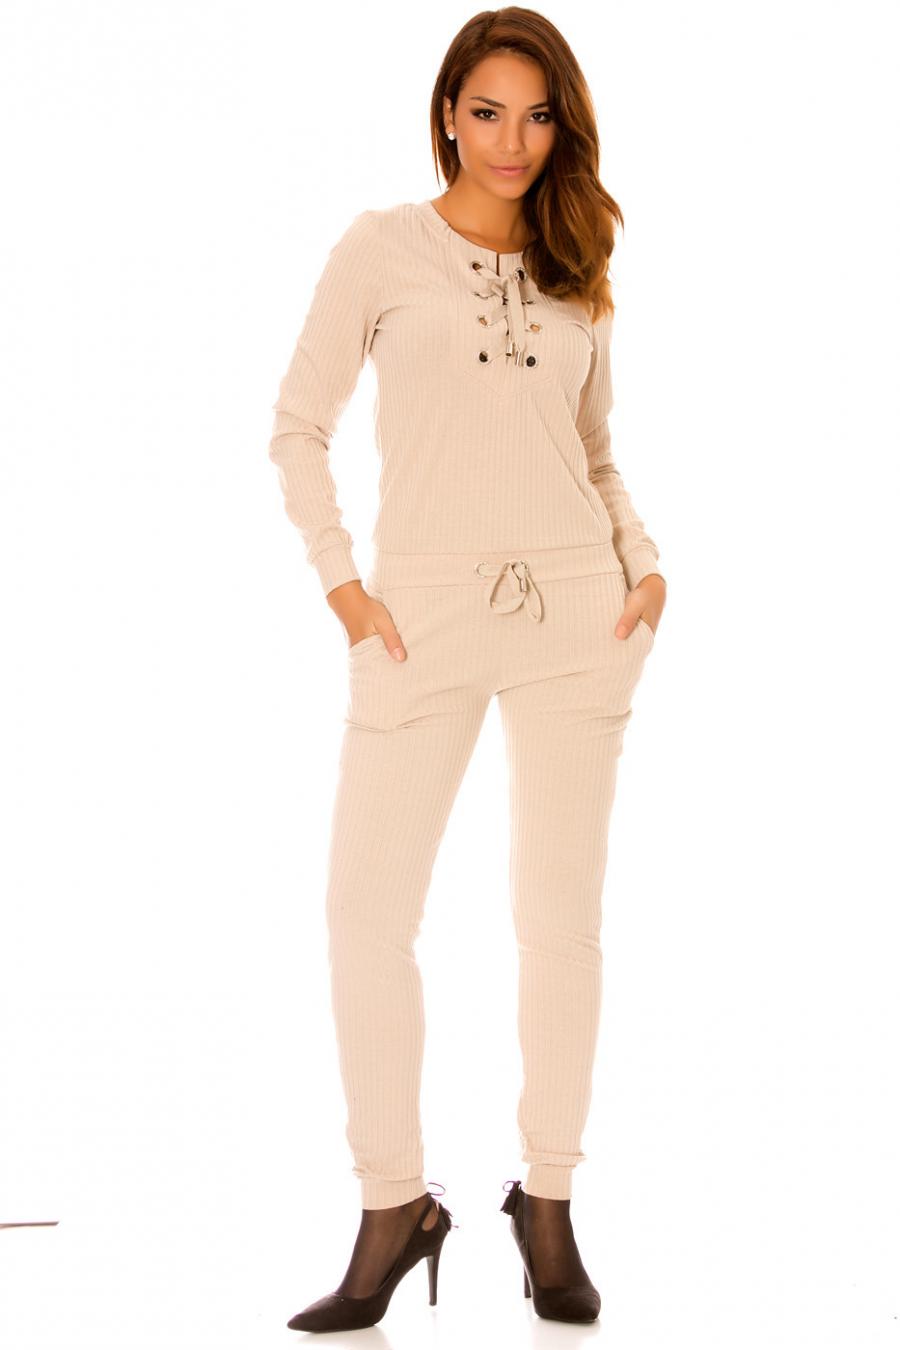 Fashionable beige mesh jumpsuit with round neck lace. Women's jumpsuit wj7136